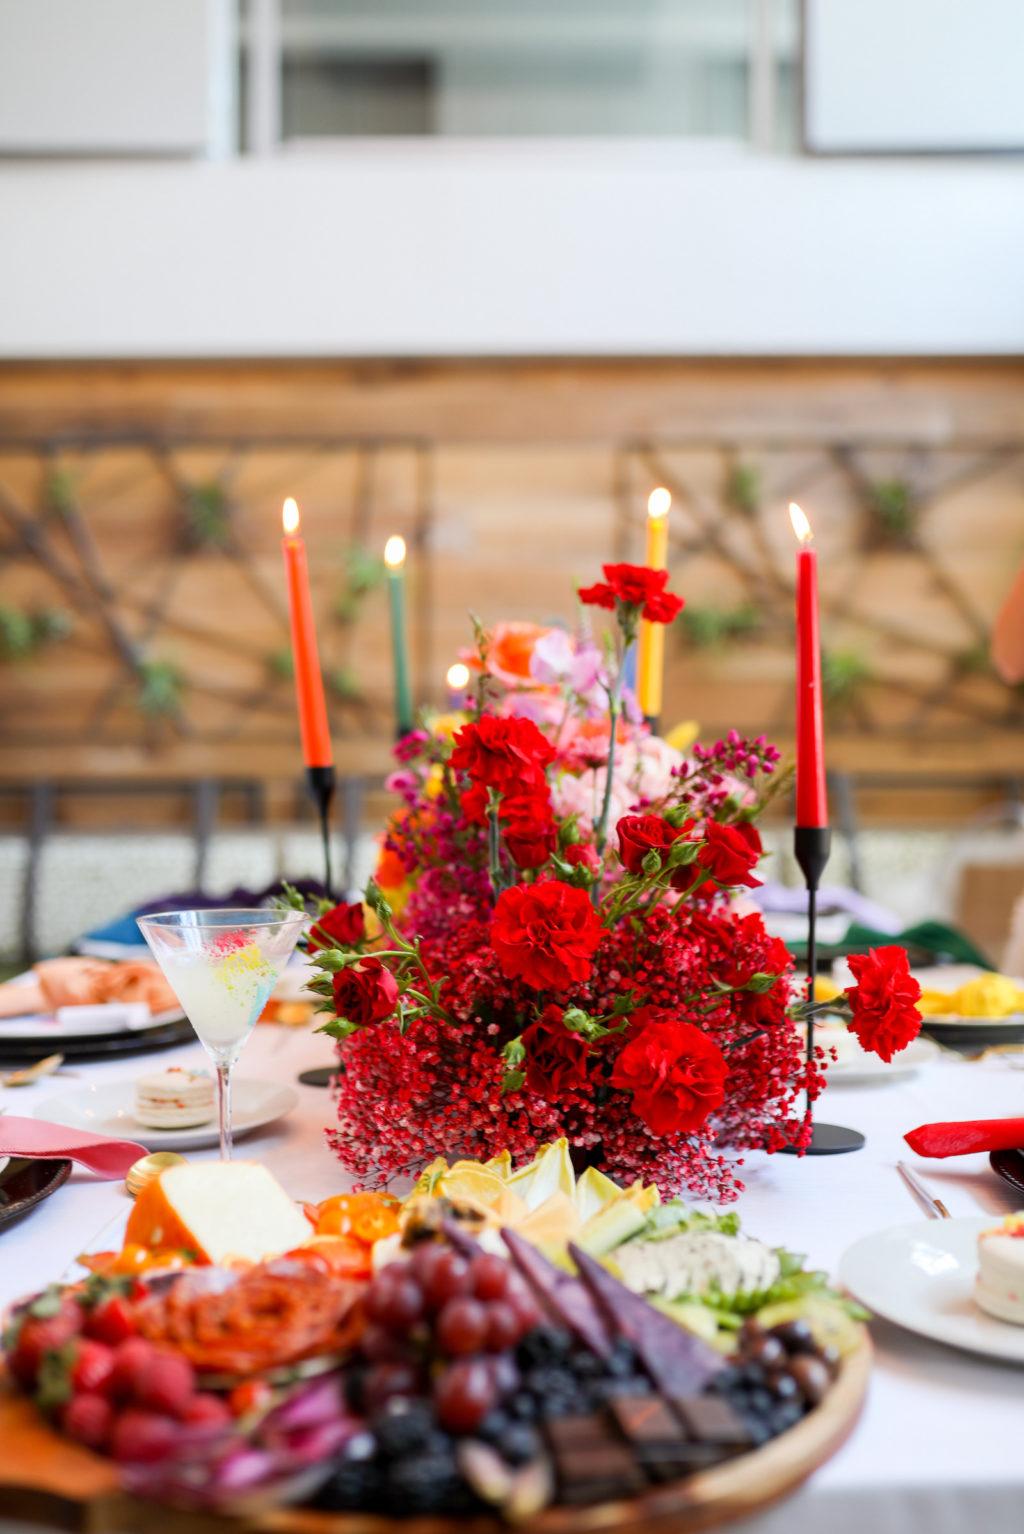 Colorful Rainbow Gay LGBTQ+ Pride Wedding Reception Decor, Red Flower Centerpiece, Candlesticks   Tampa Bay Wedding Planner Stephany Perry Events   Wedding Venue Hotel Alba